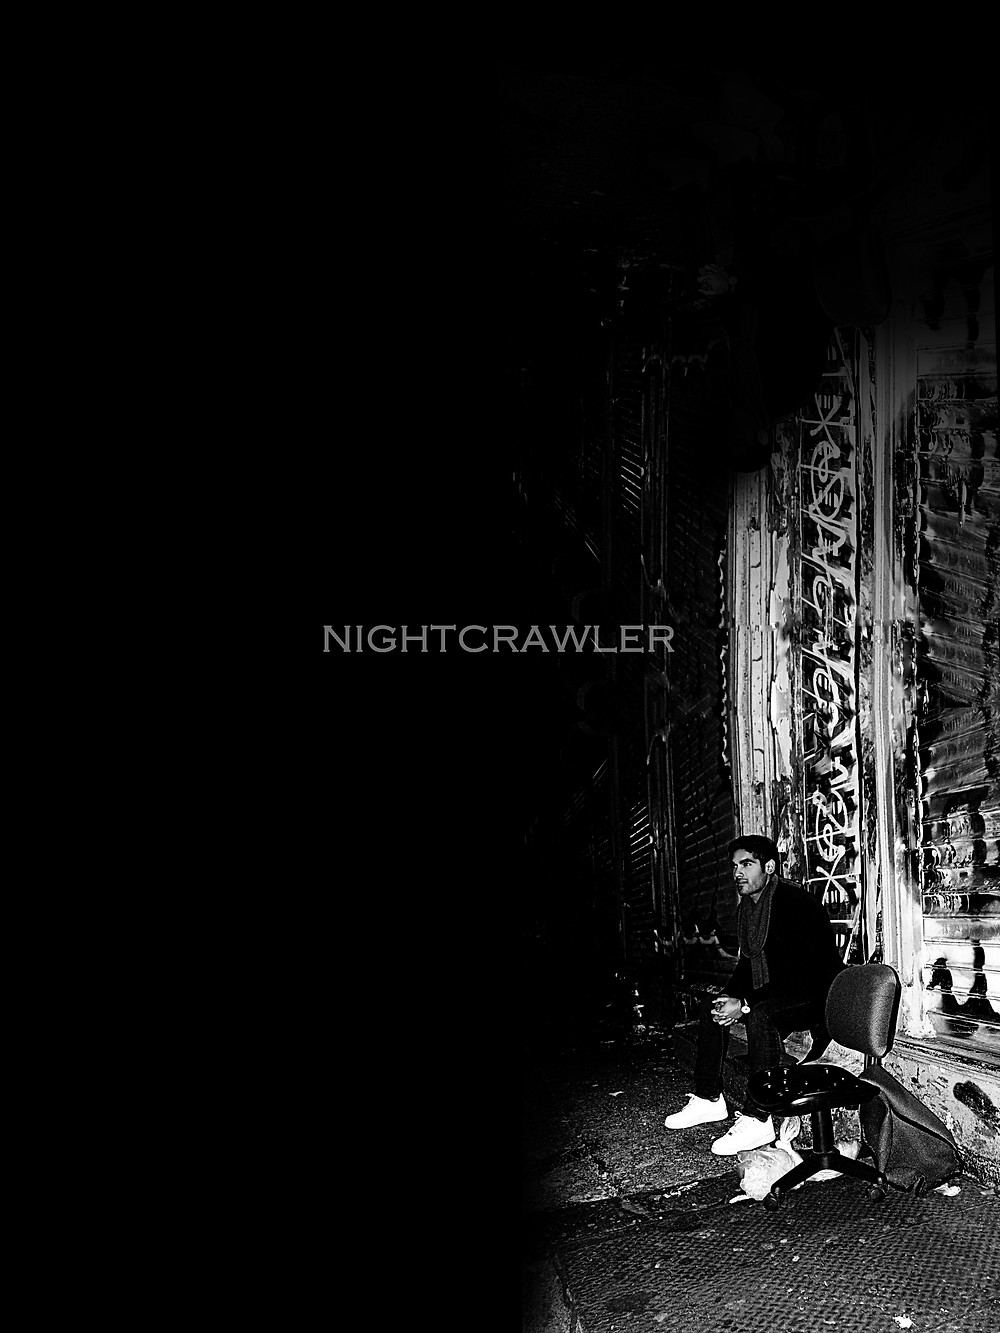 aNightCrawler.jpg